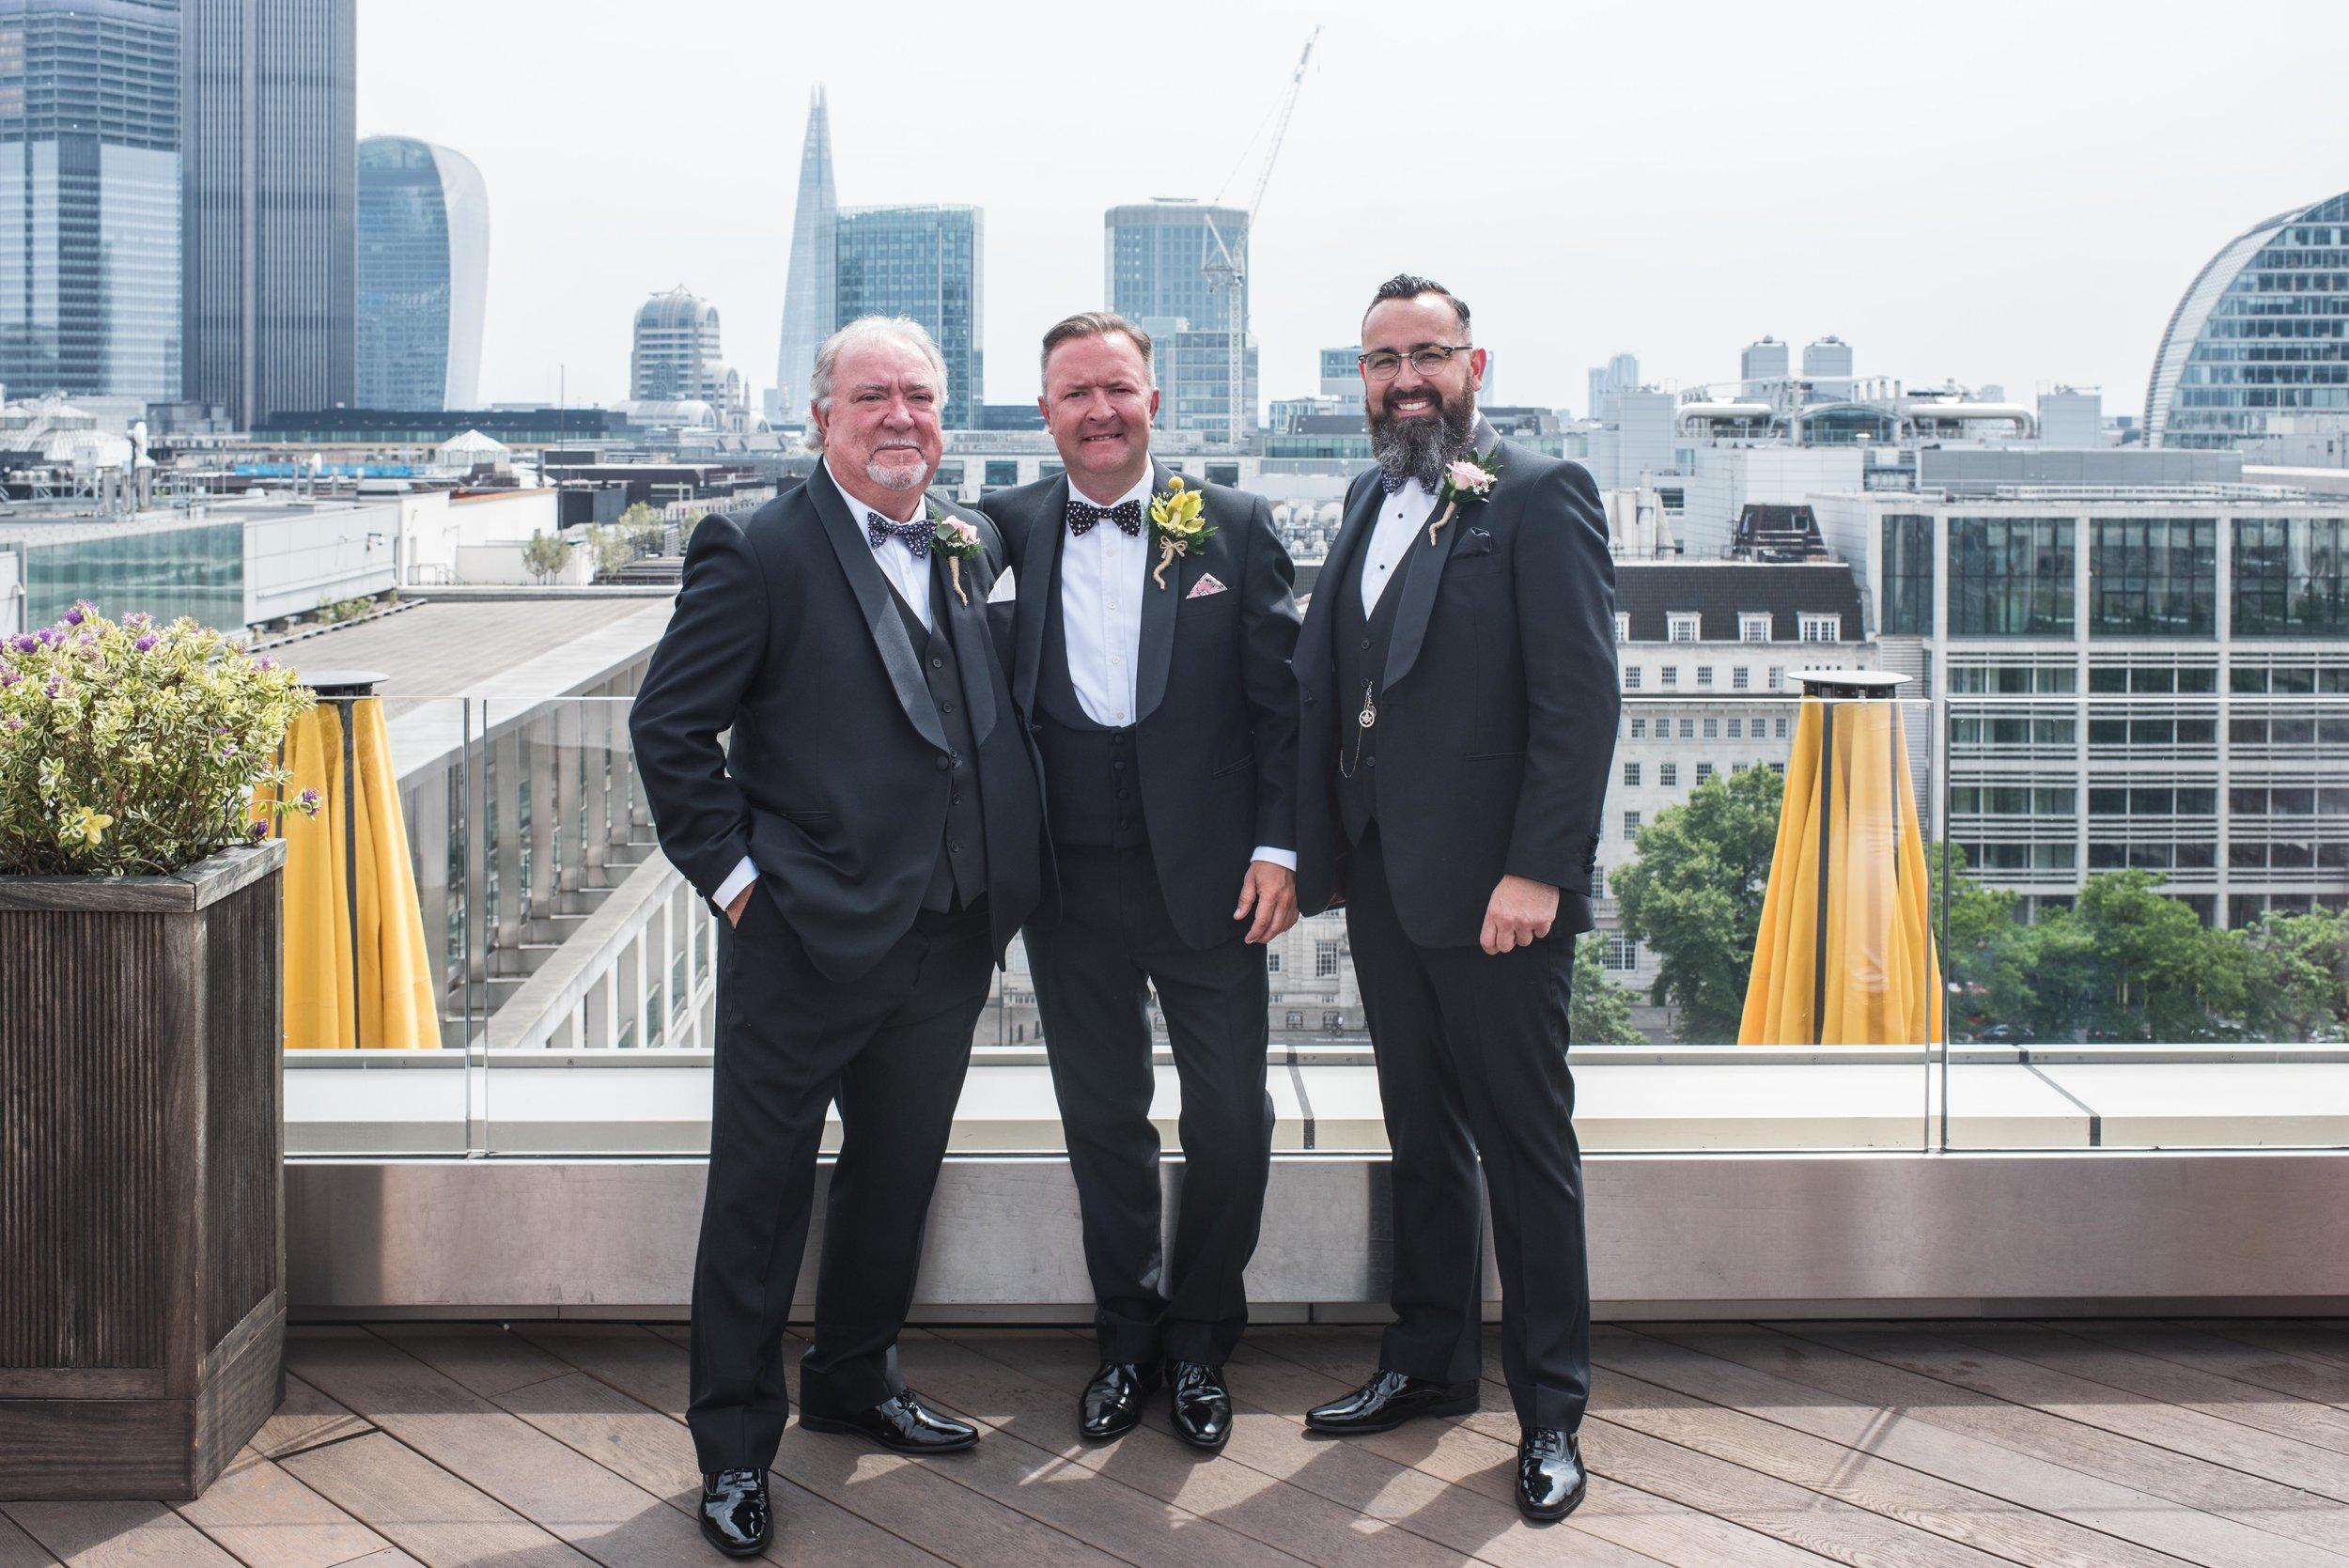 D&M_Marylebone Town Hall Wedding (30 of 239).jpg